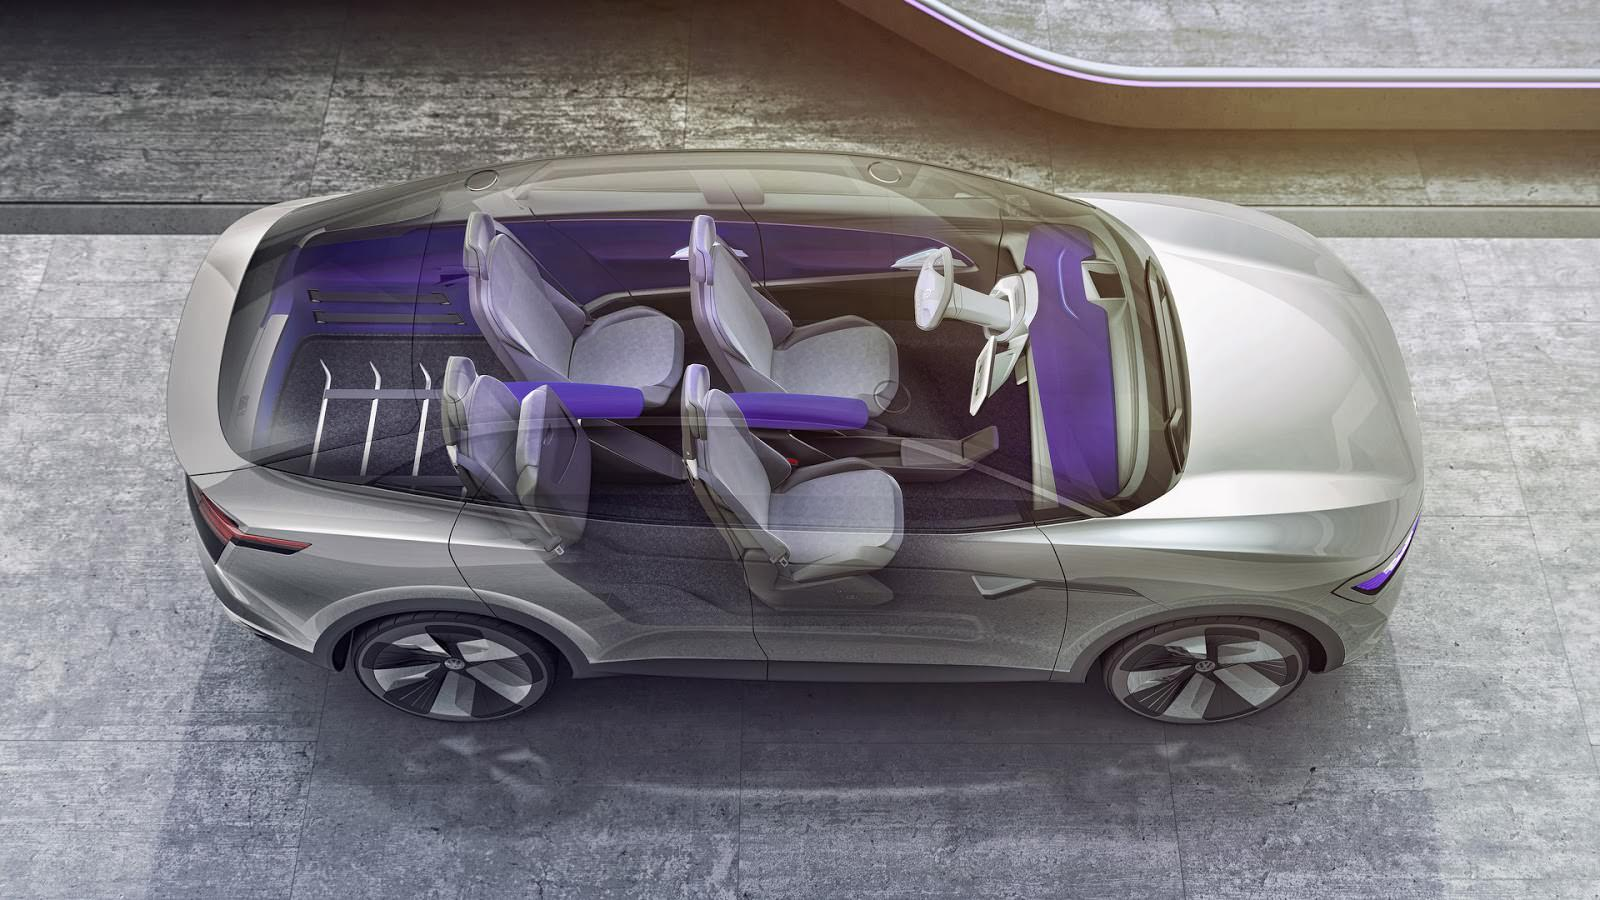 Конфигурация салона Volkswagen I.D. Crozz Concept 2017